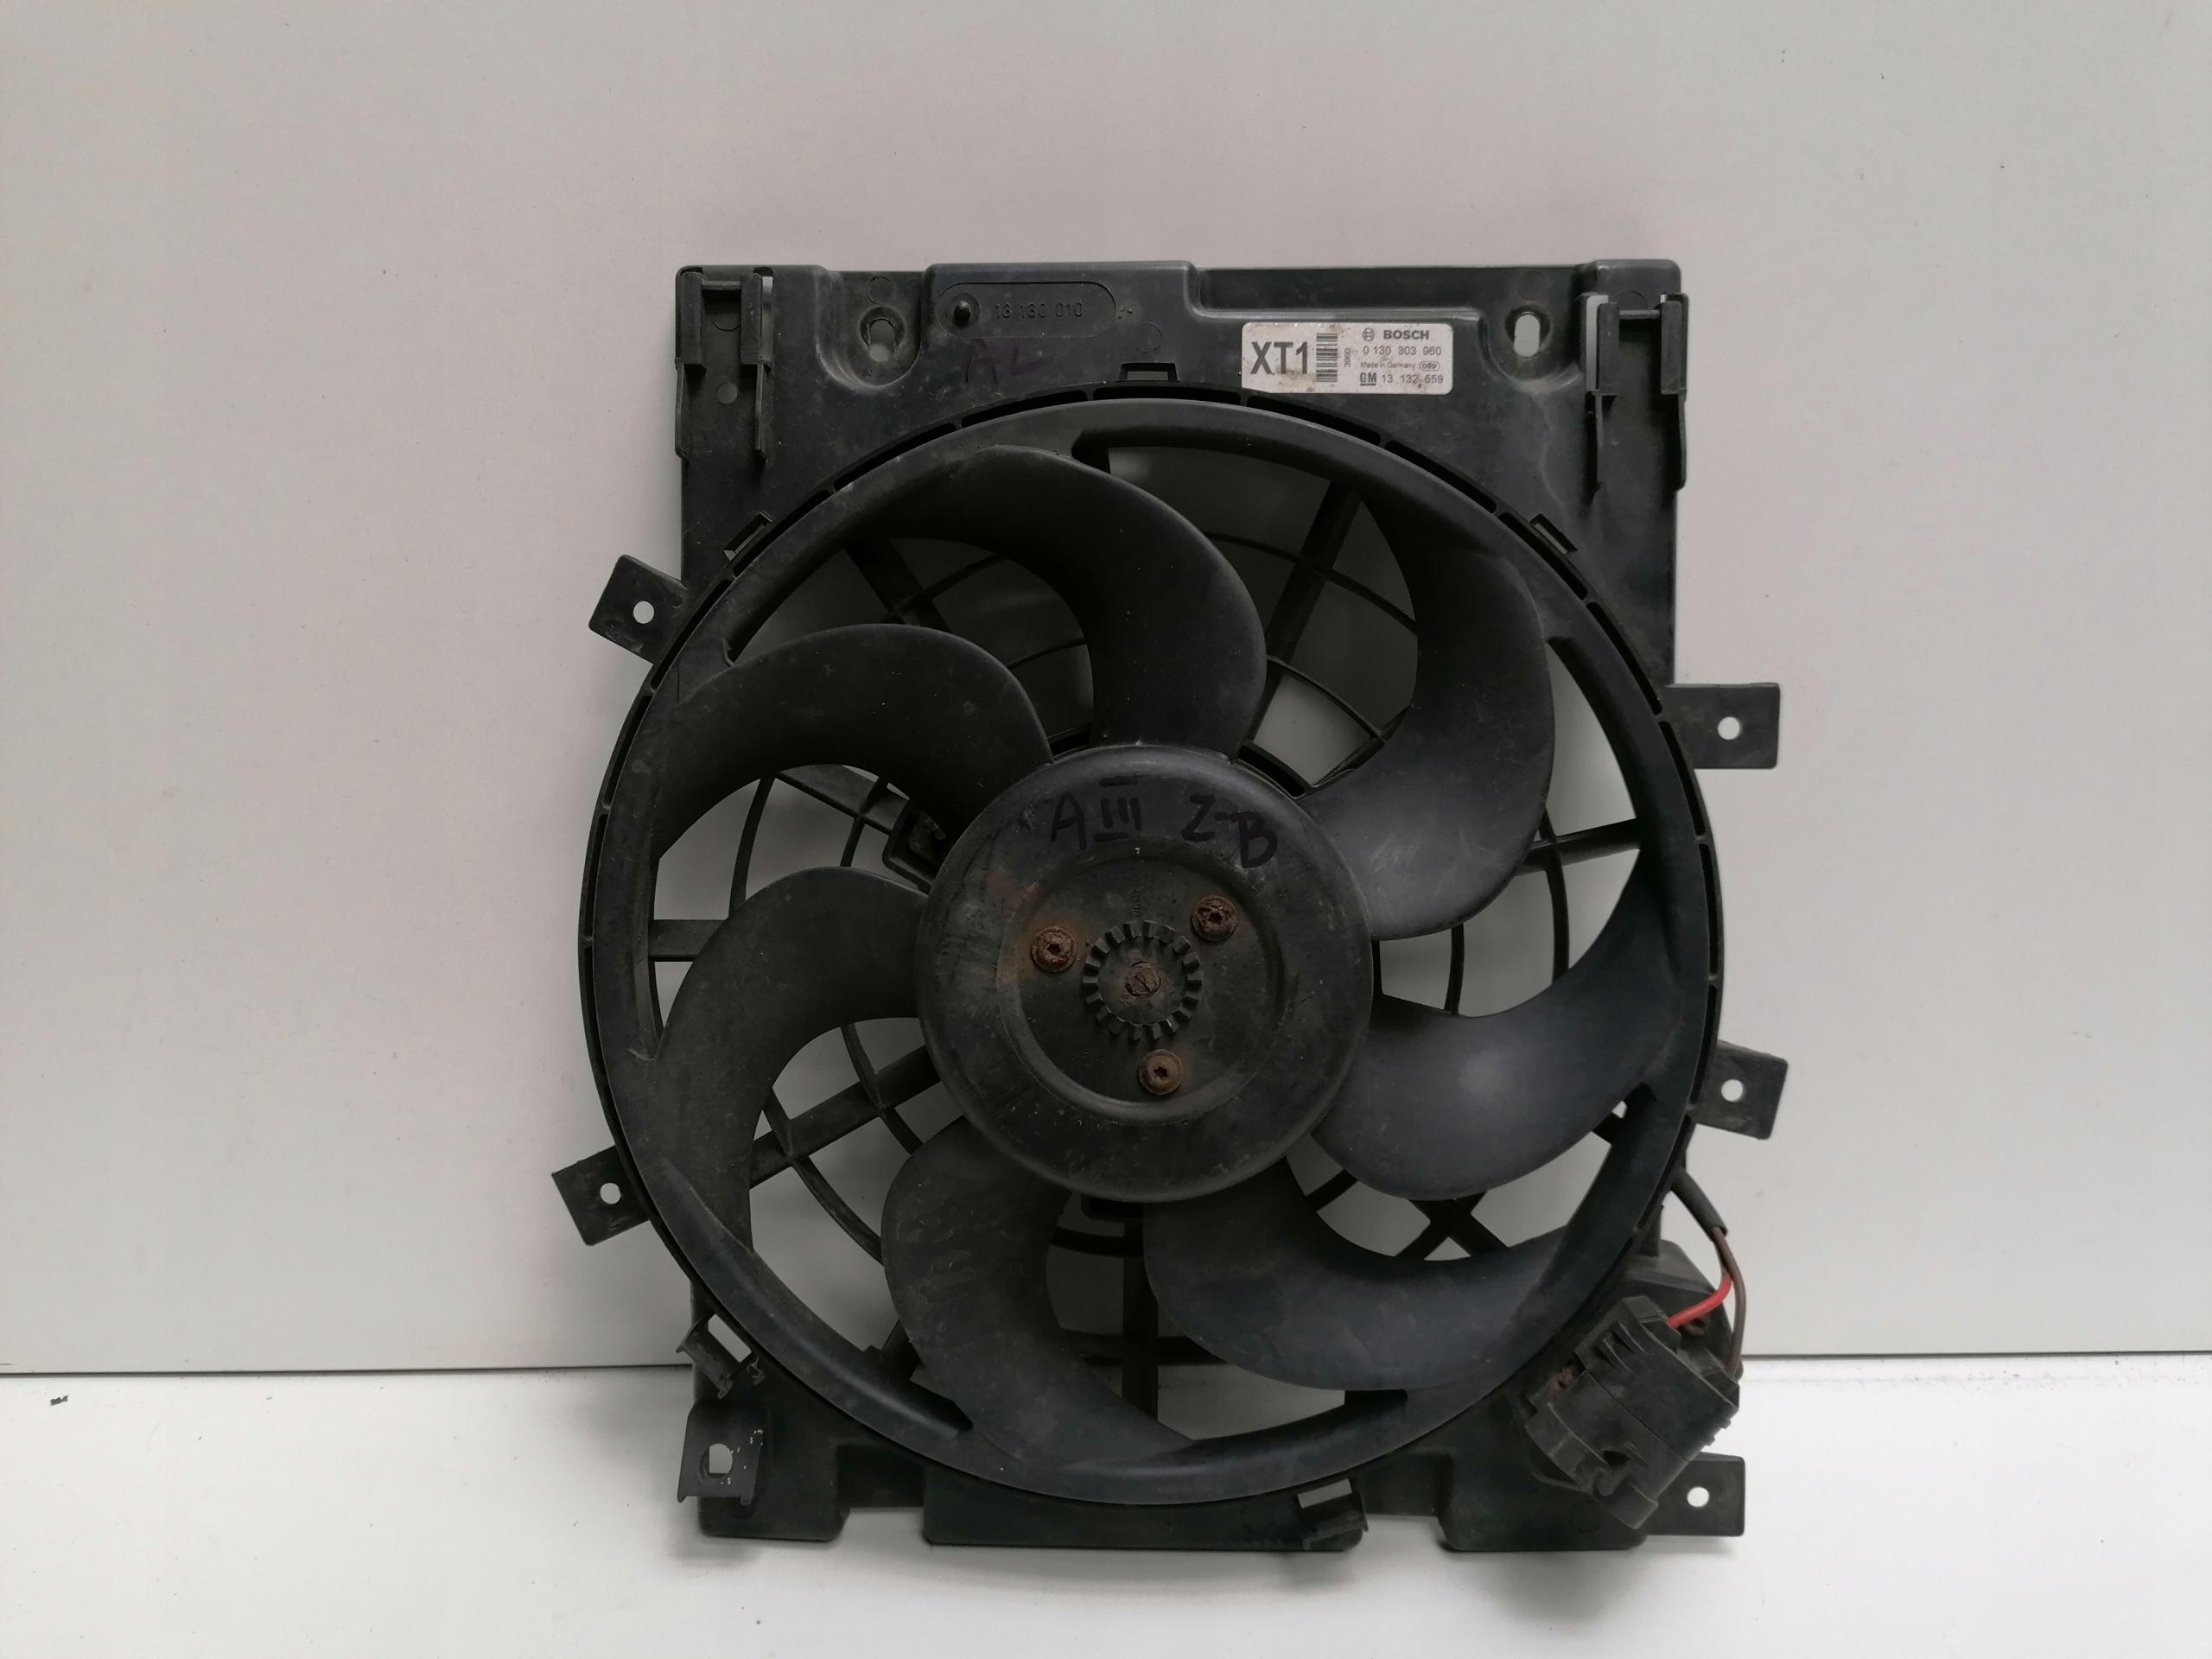 вентилятор кондиционирования воздуха opel astra h  zafira b